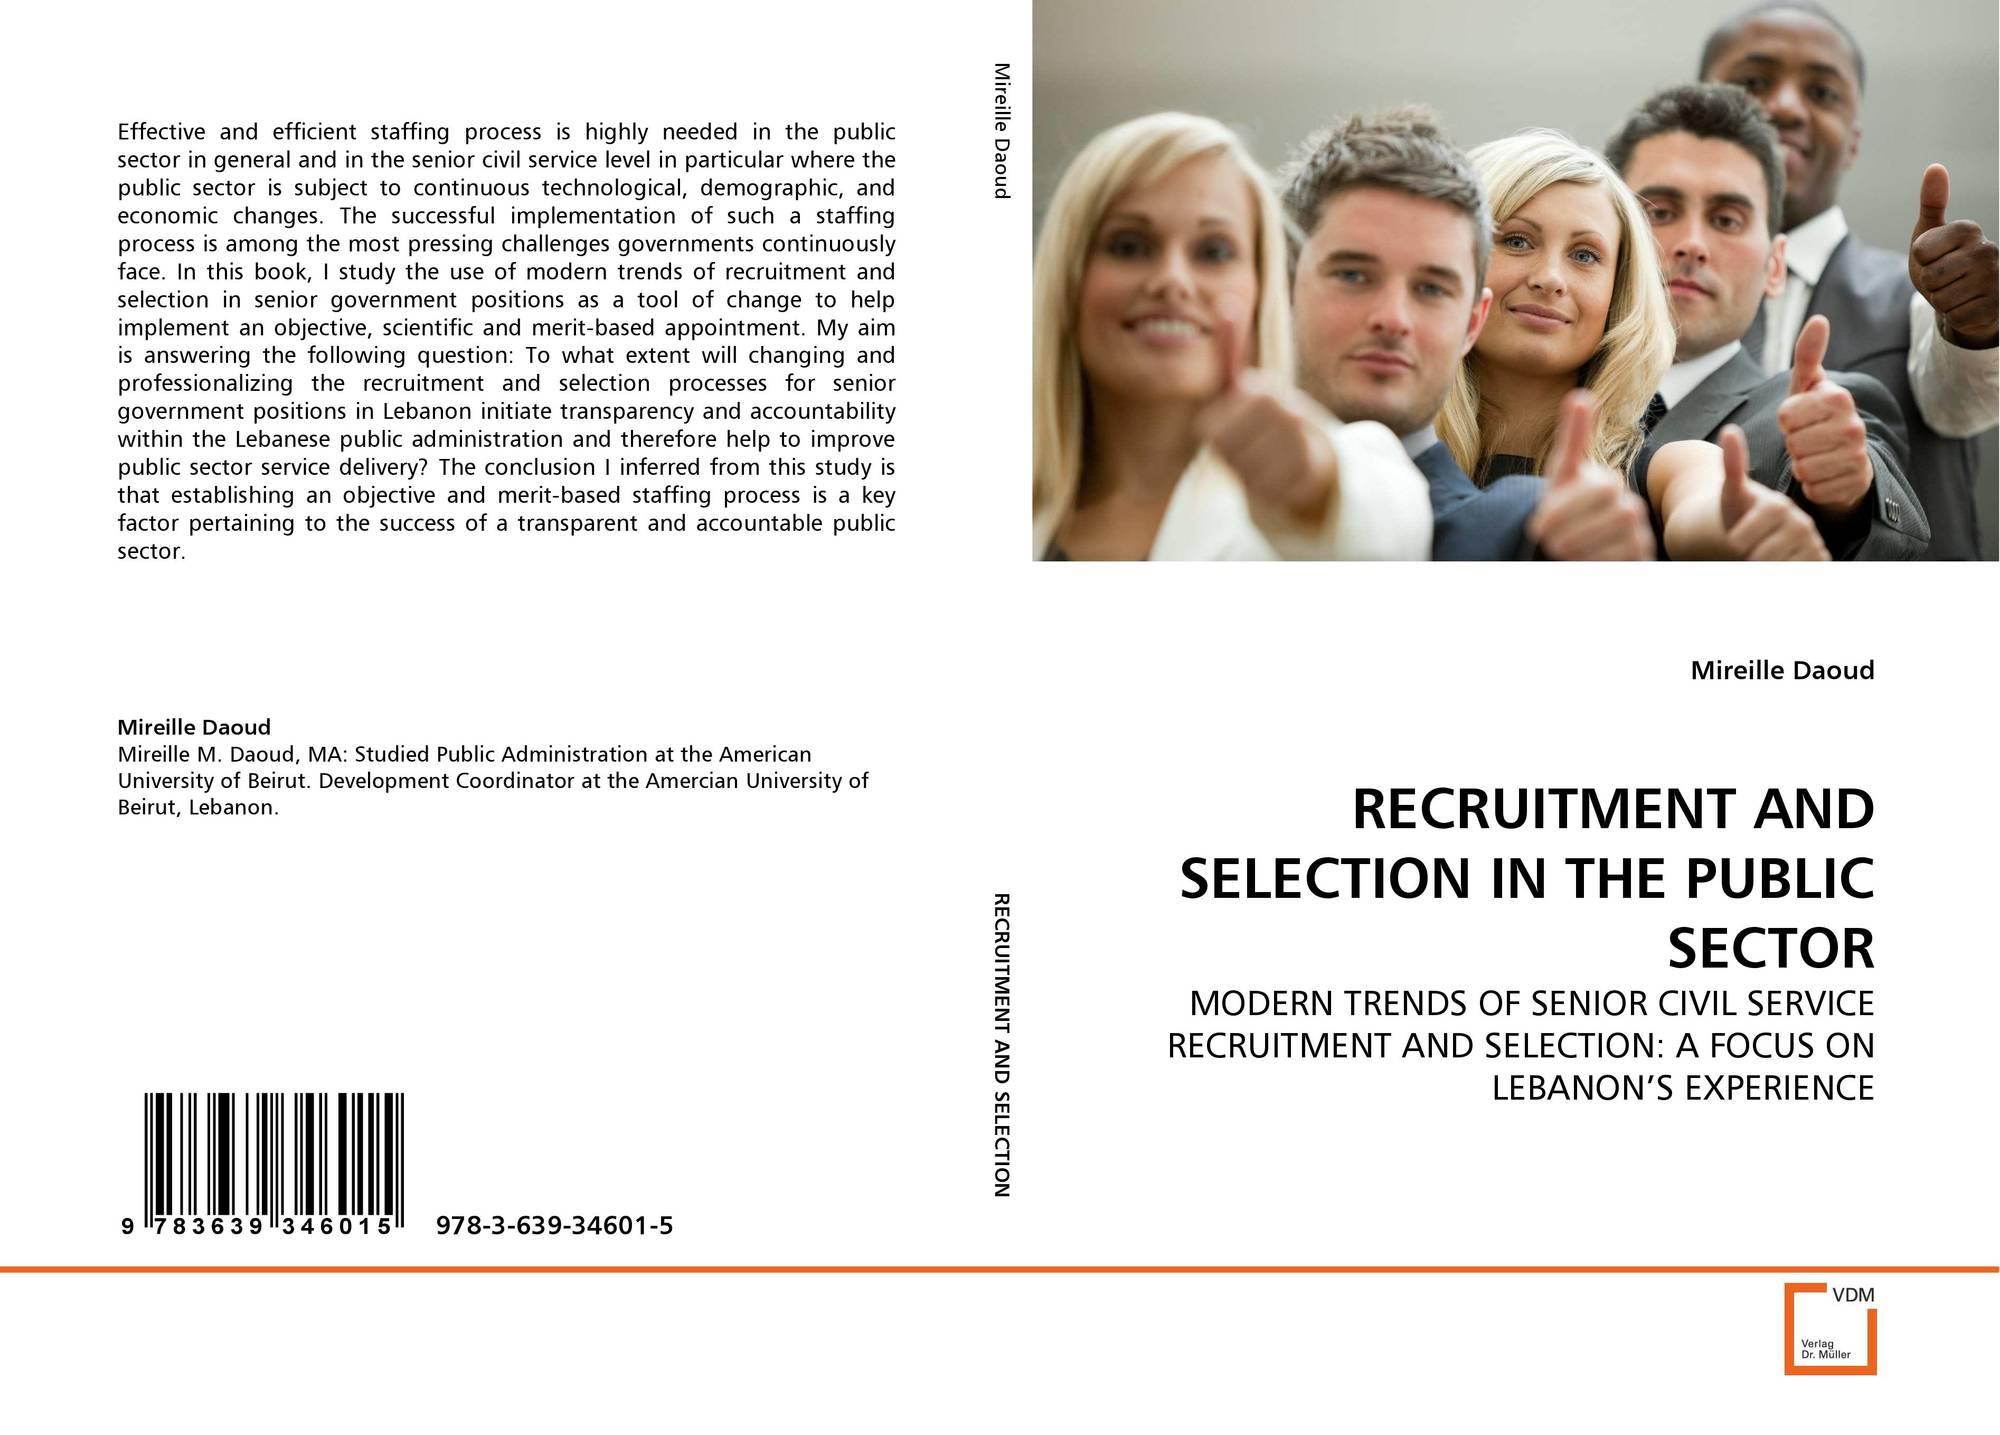 dabur recruitment process